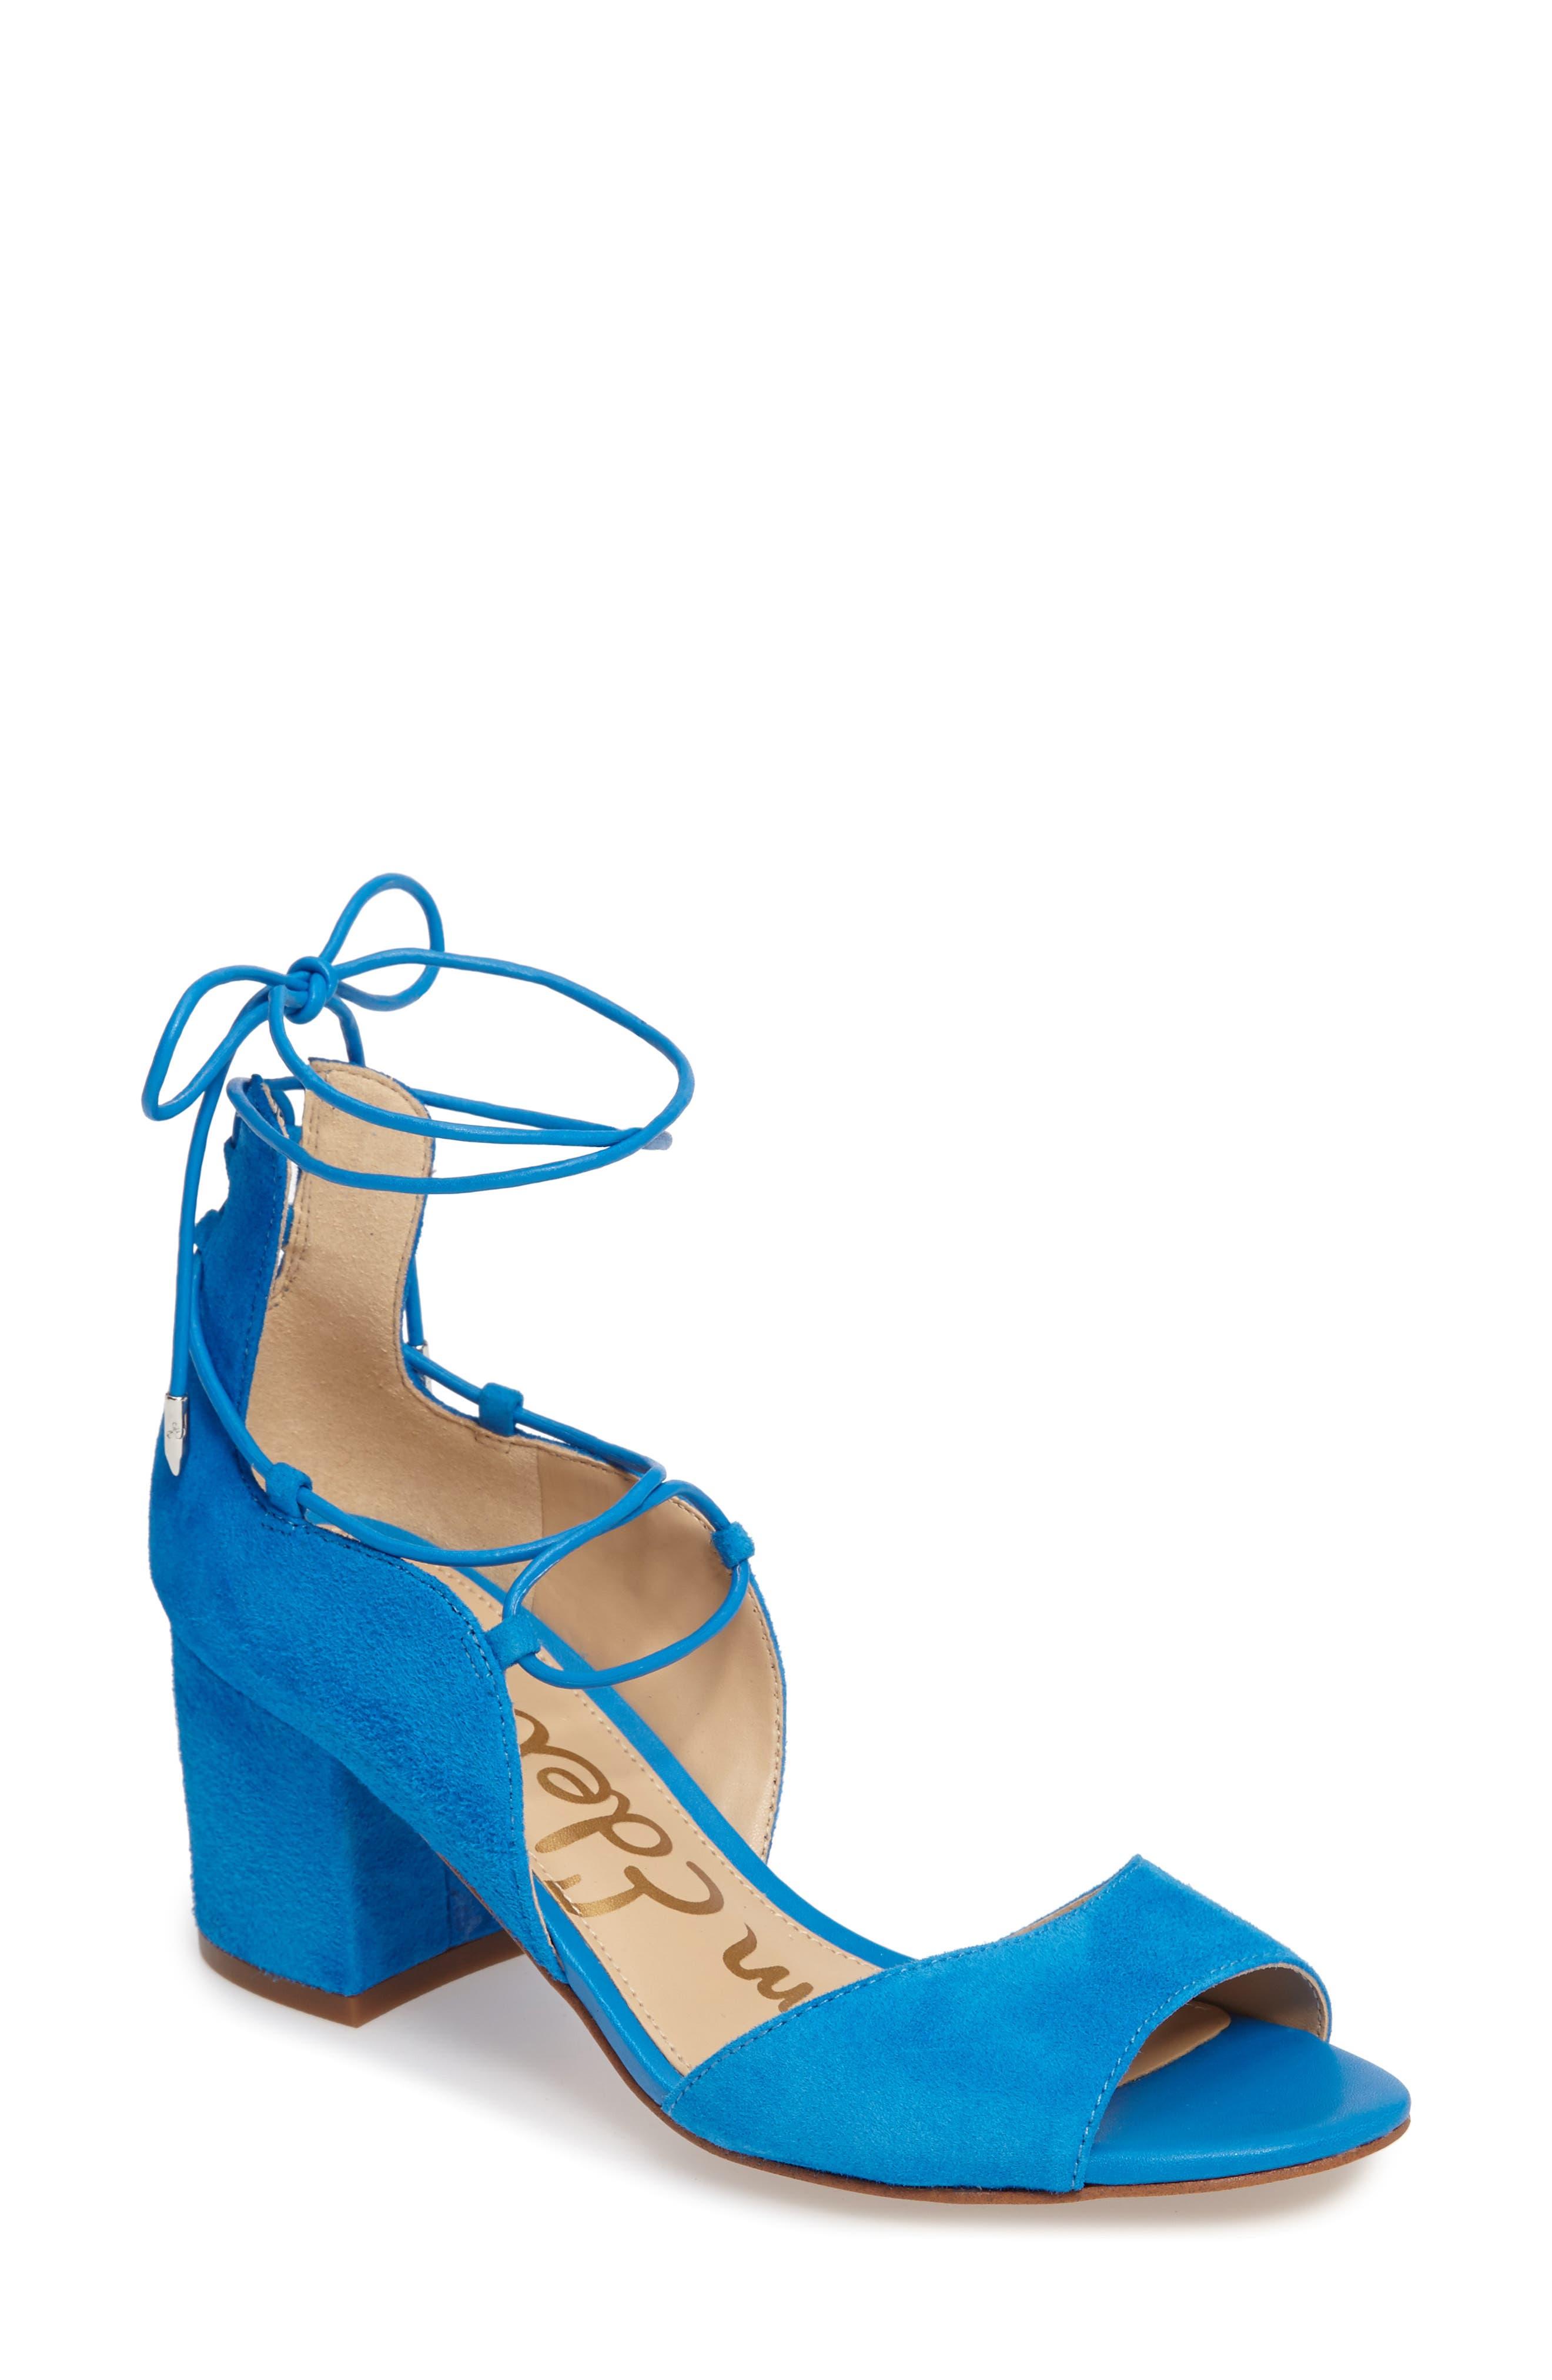 Alternate Image 1 Selected - Sam Edelman Serene Lace-Up Sandal (Women)